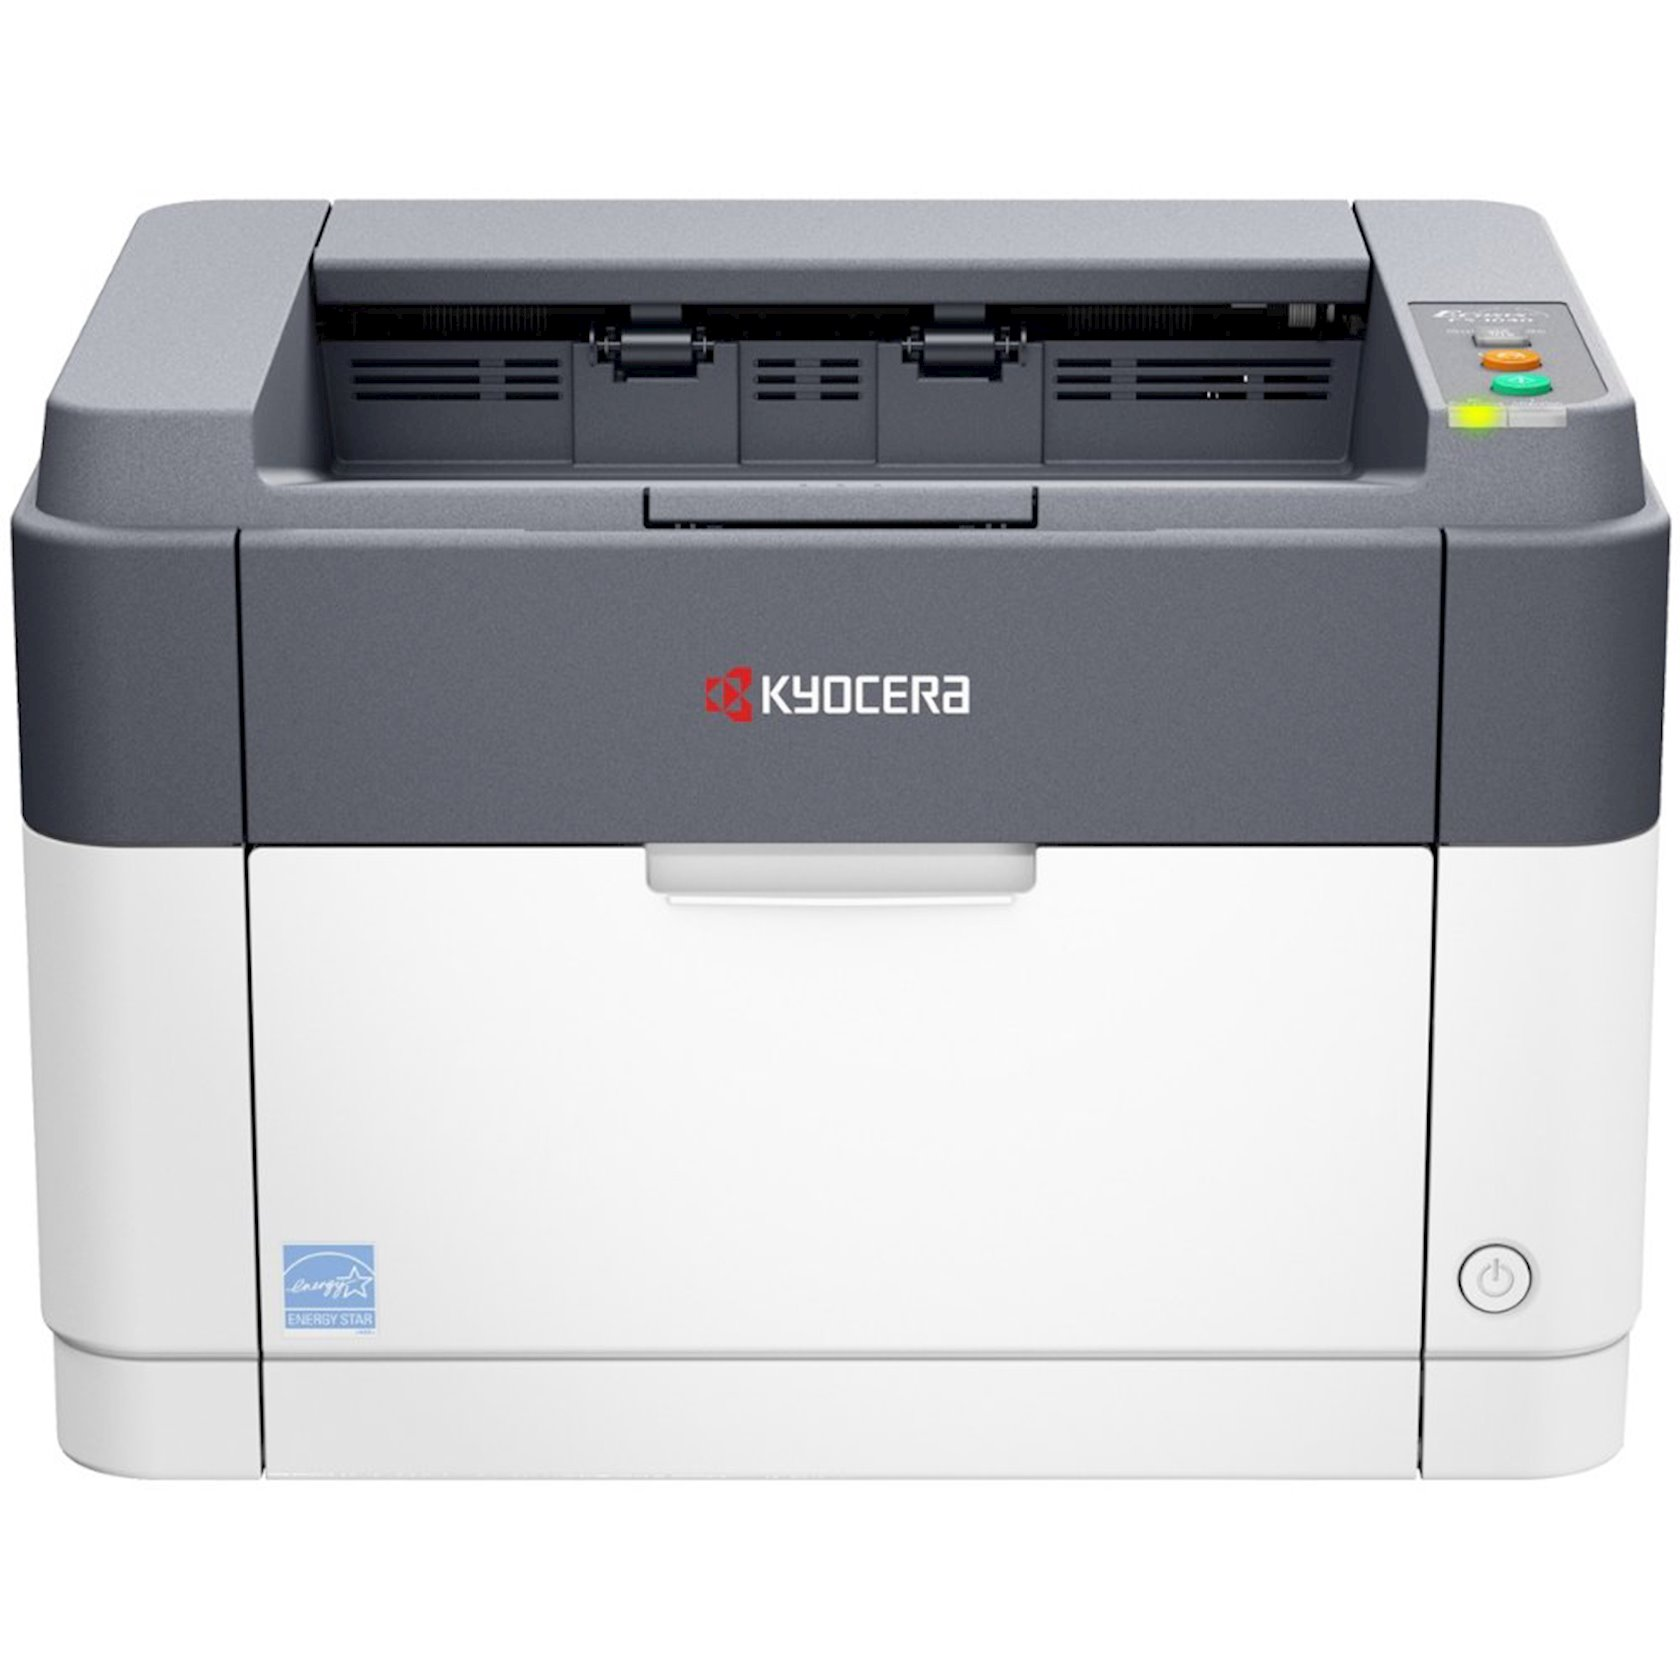 Printer Kyocera Ecosys FS-1040